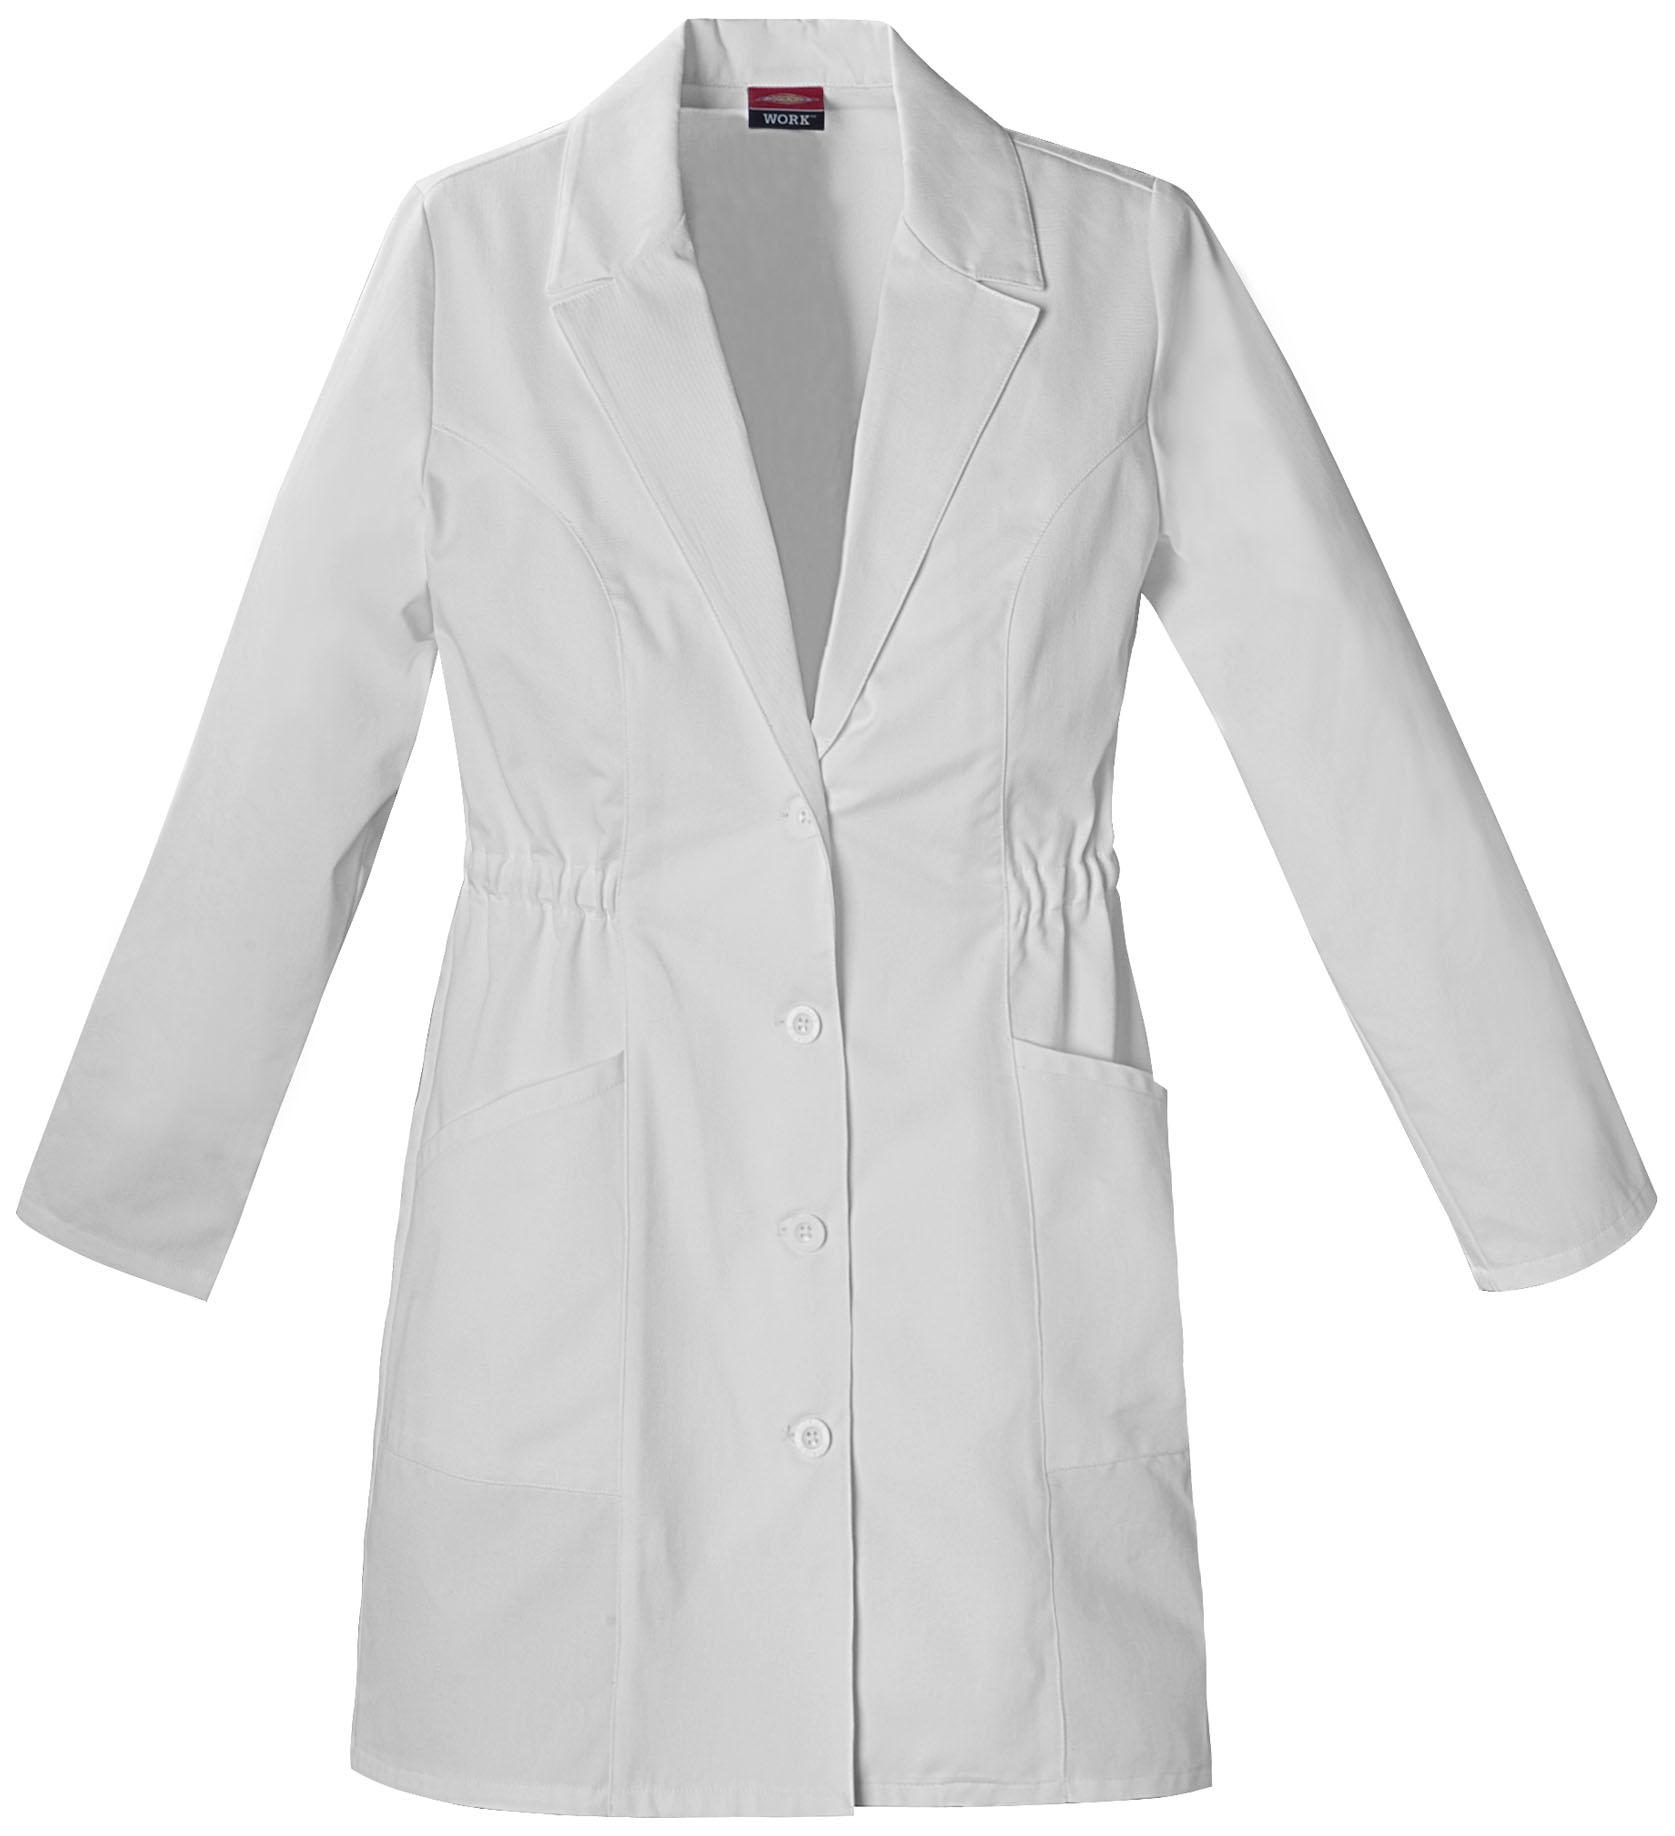 34 Quot Women S Lab Coat Avida Healthwear Inc